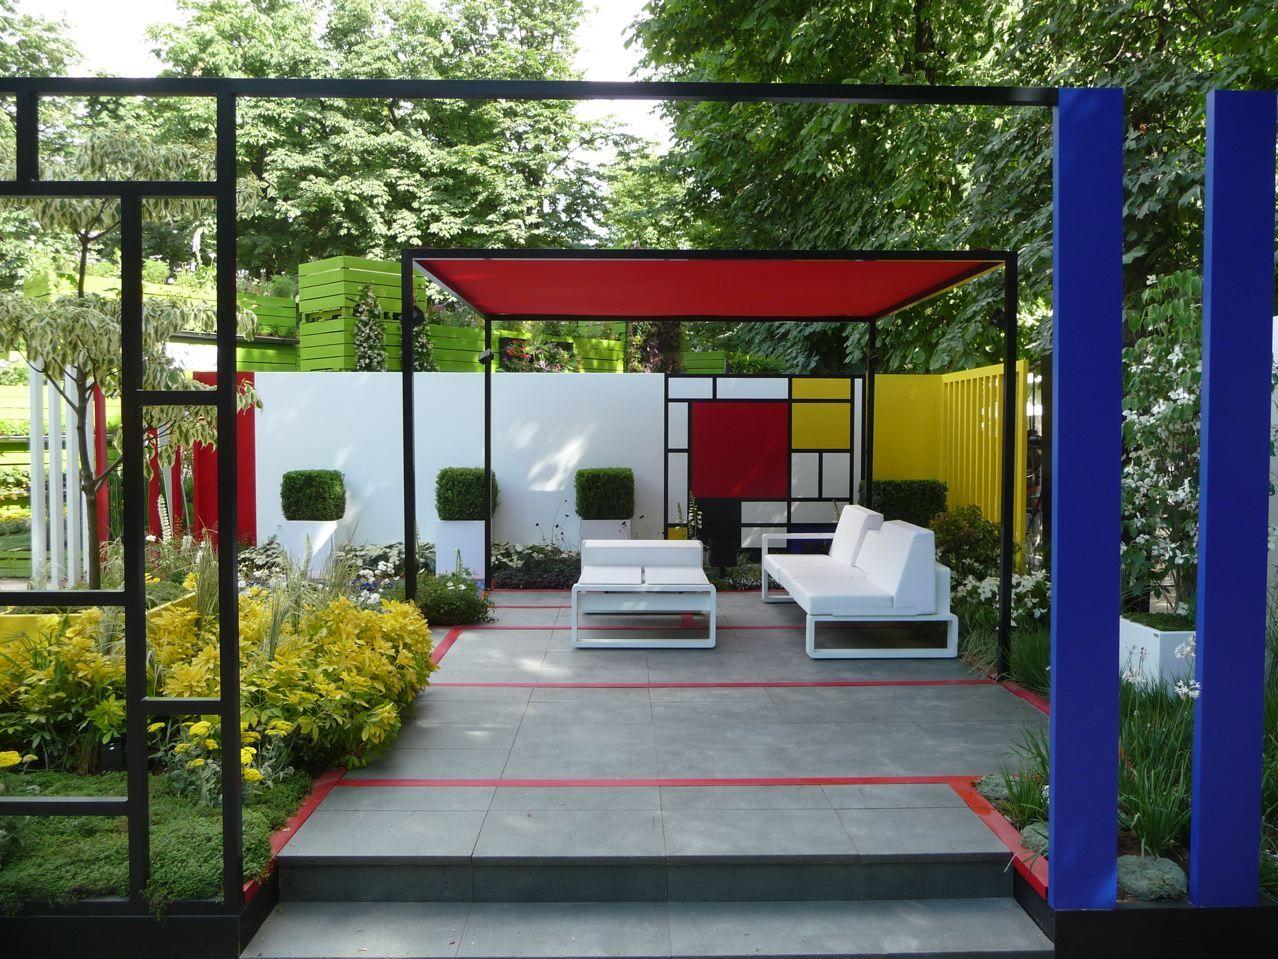 jardin design photo - Google Search | interior design | Pinterest ...